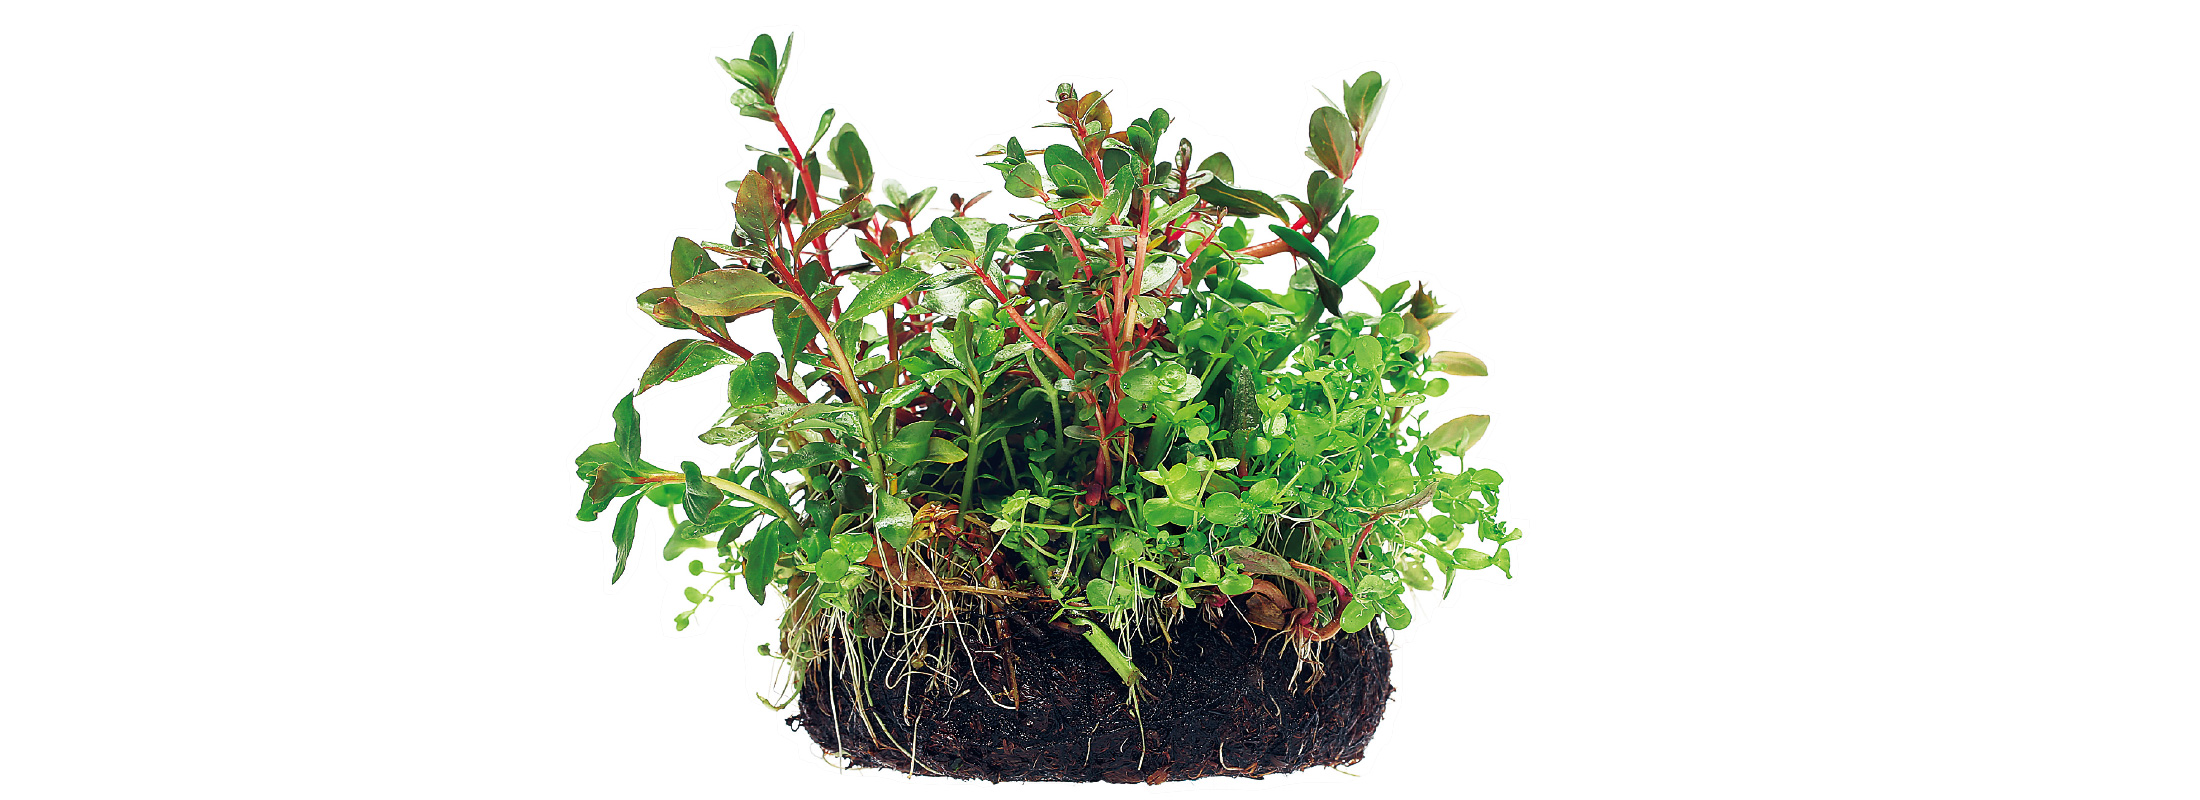 Let's grow aquatic plants simple & easy.